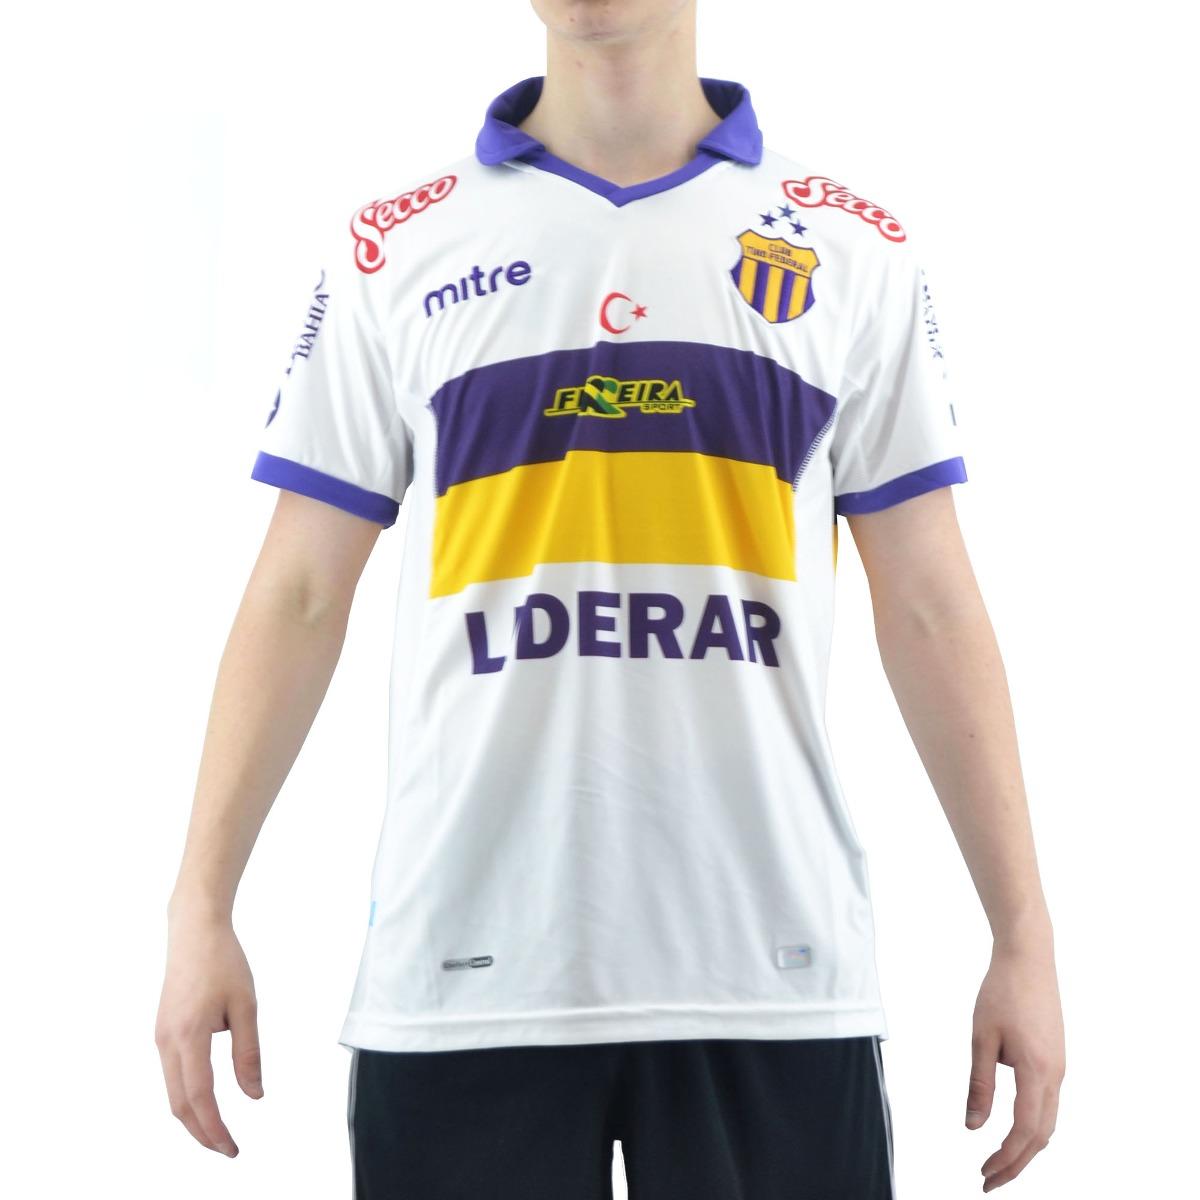 camiseta mitre futbol oficial club tiro federal 2016. Cargando zoom. 31008f96a6bcd